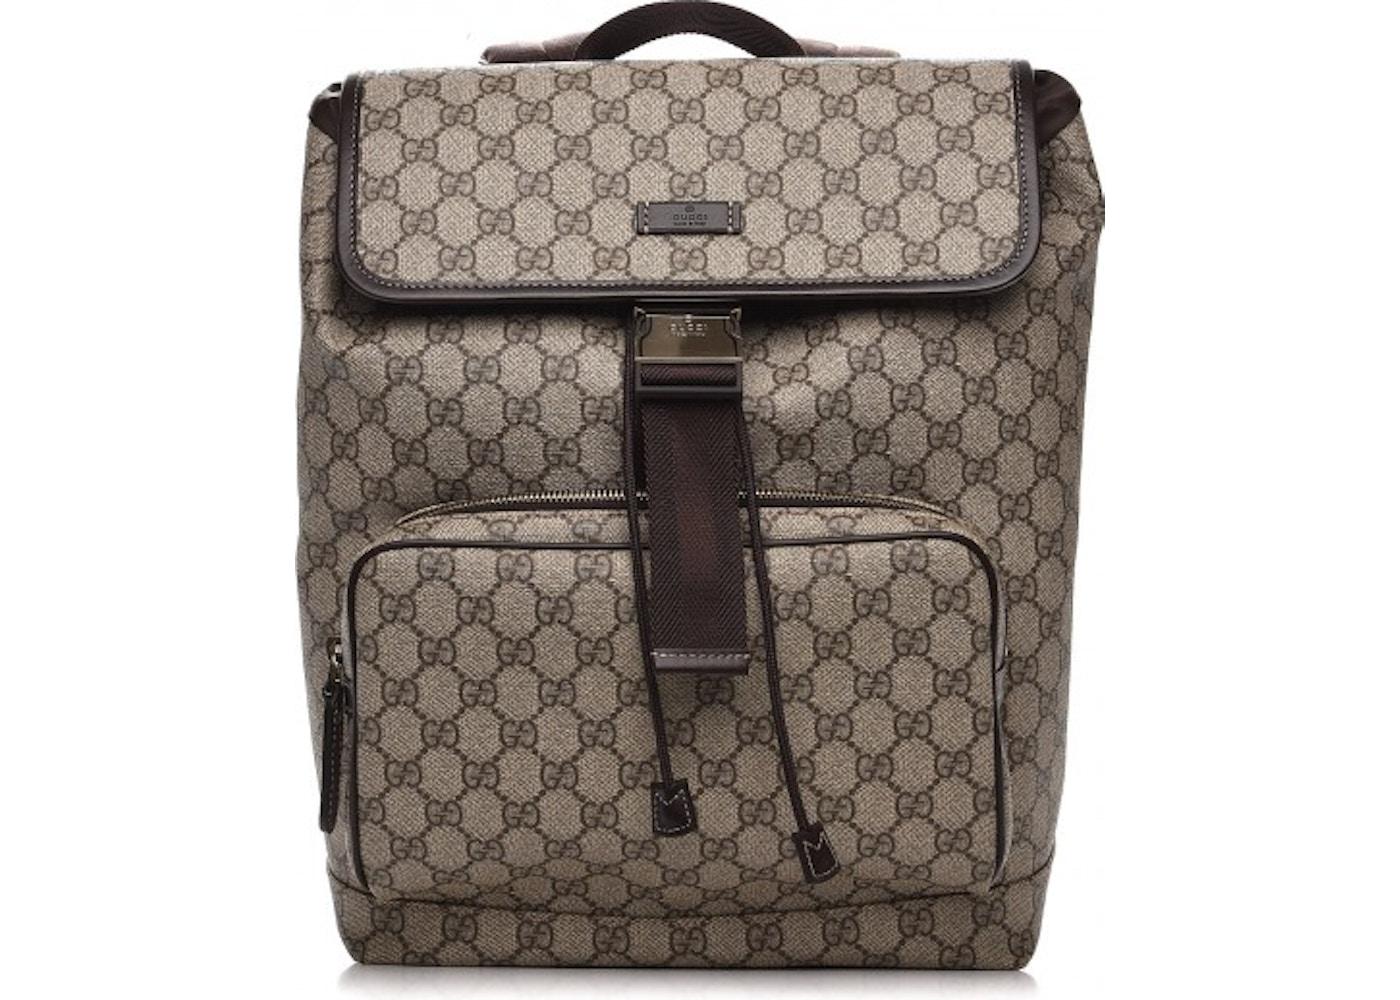 e5765b6d9 Buy & Sell Gucci Other Handbags - New Highest Bids